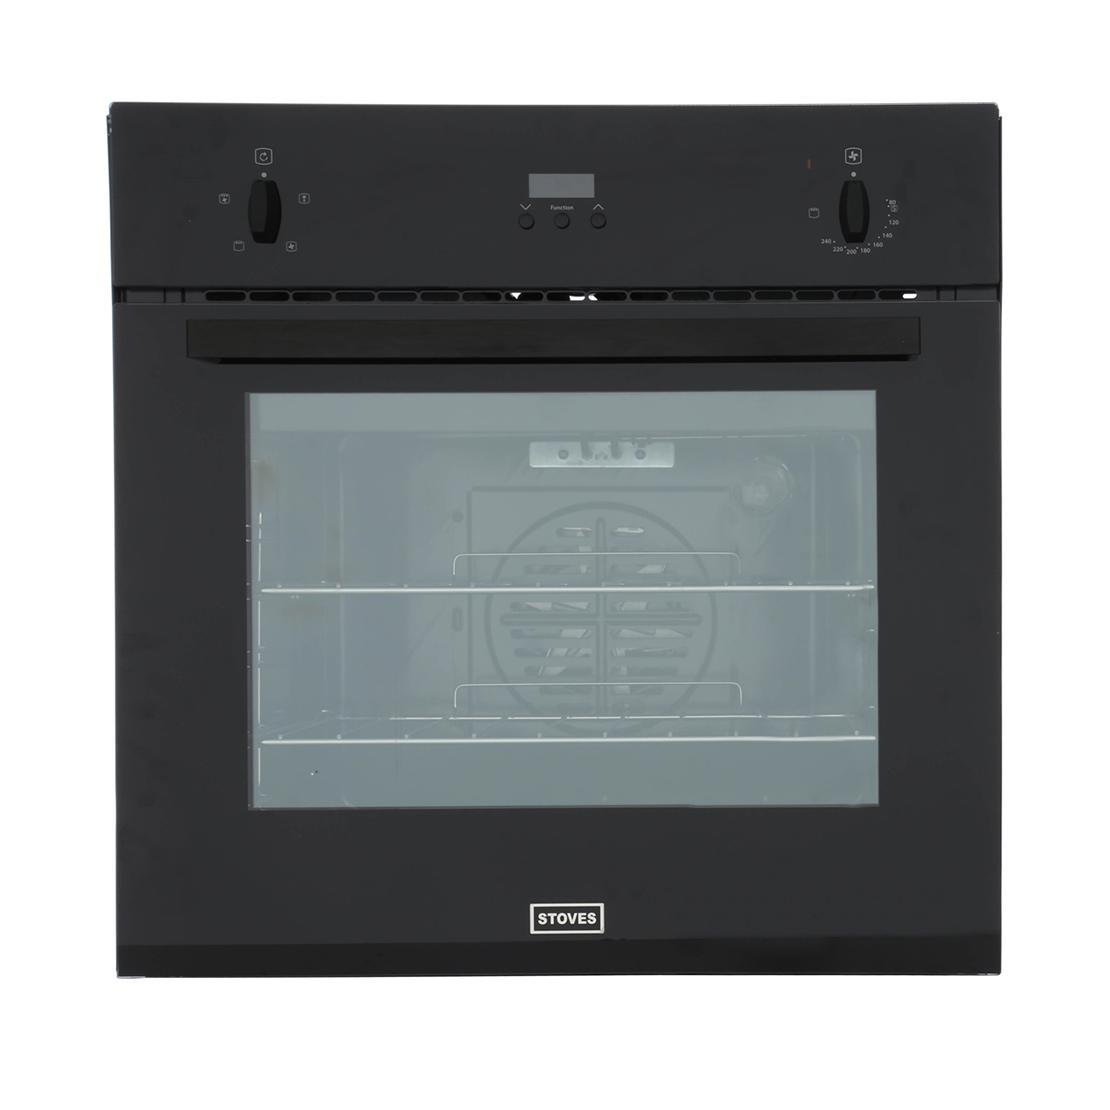 Stoves SEB600FP Black Single Built In Electric Oven